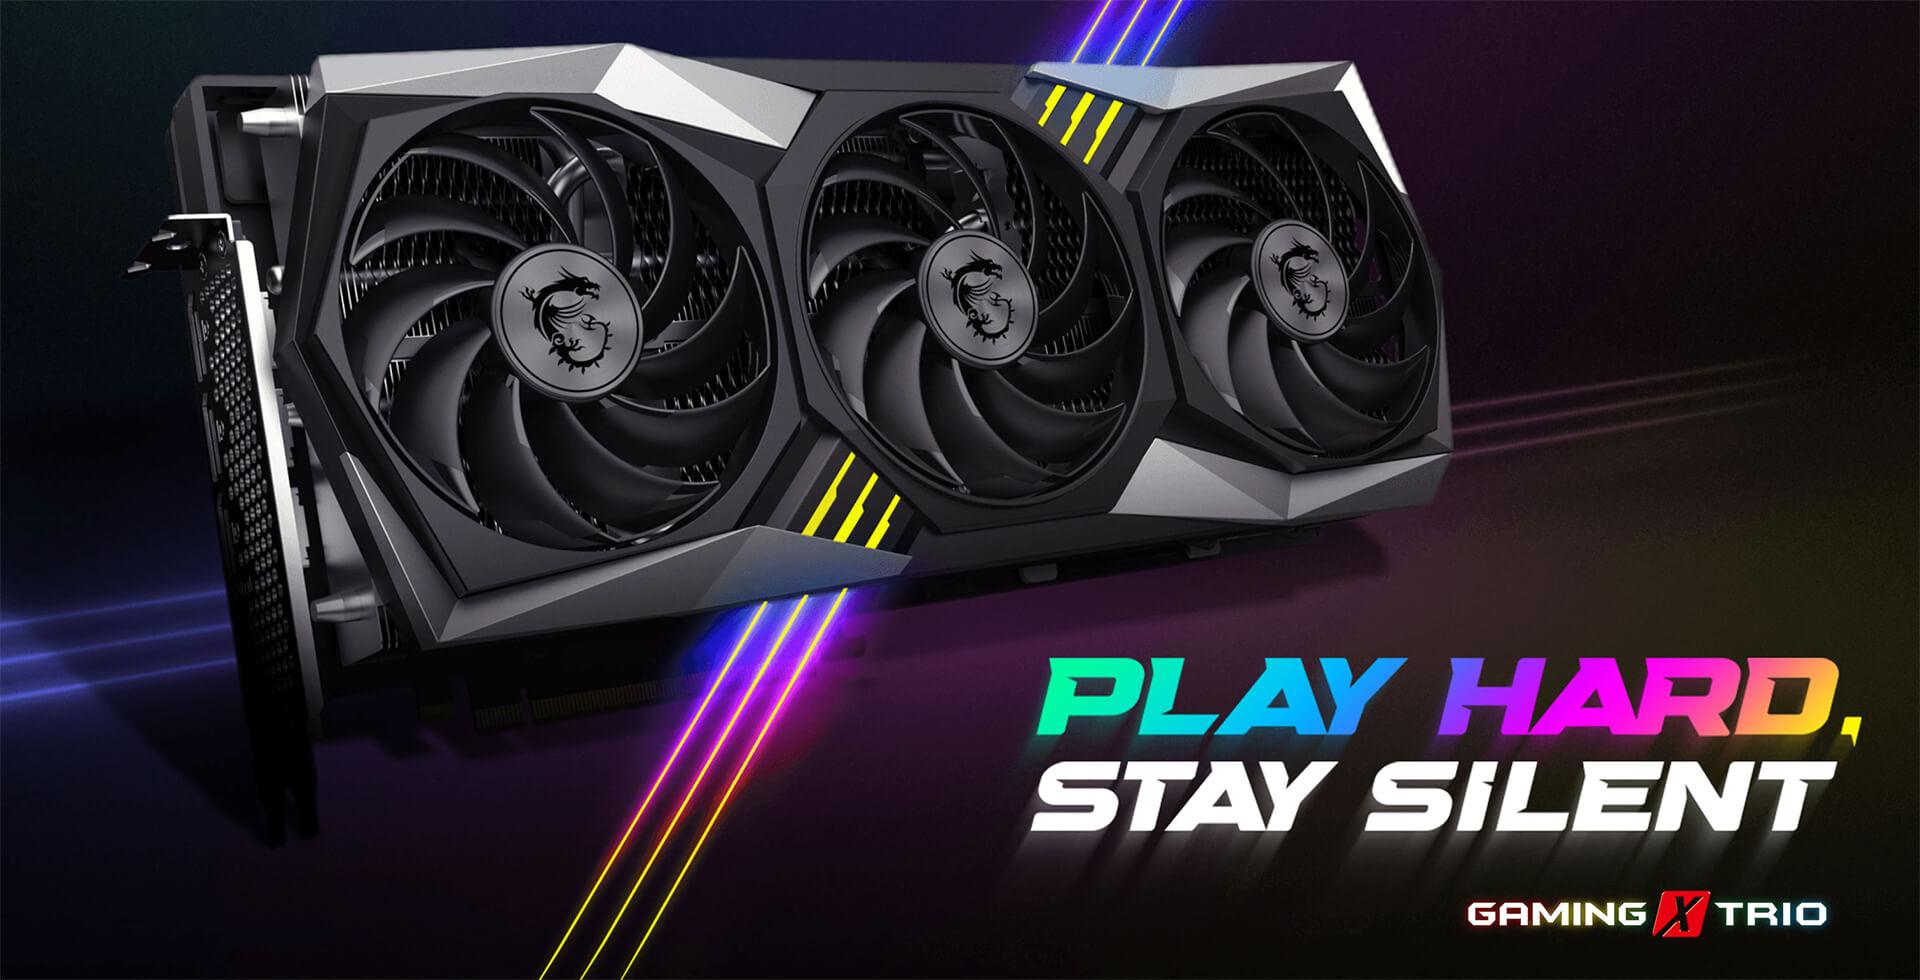 Msi Radeon™ Rx 6900 Xt Gaming X Trio 16g 16gb Gddr6 Features